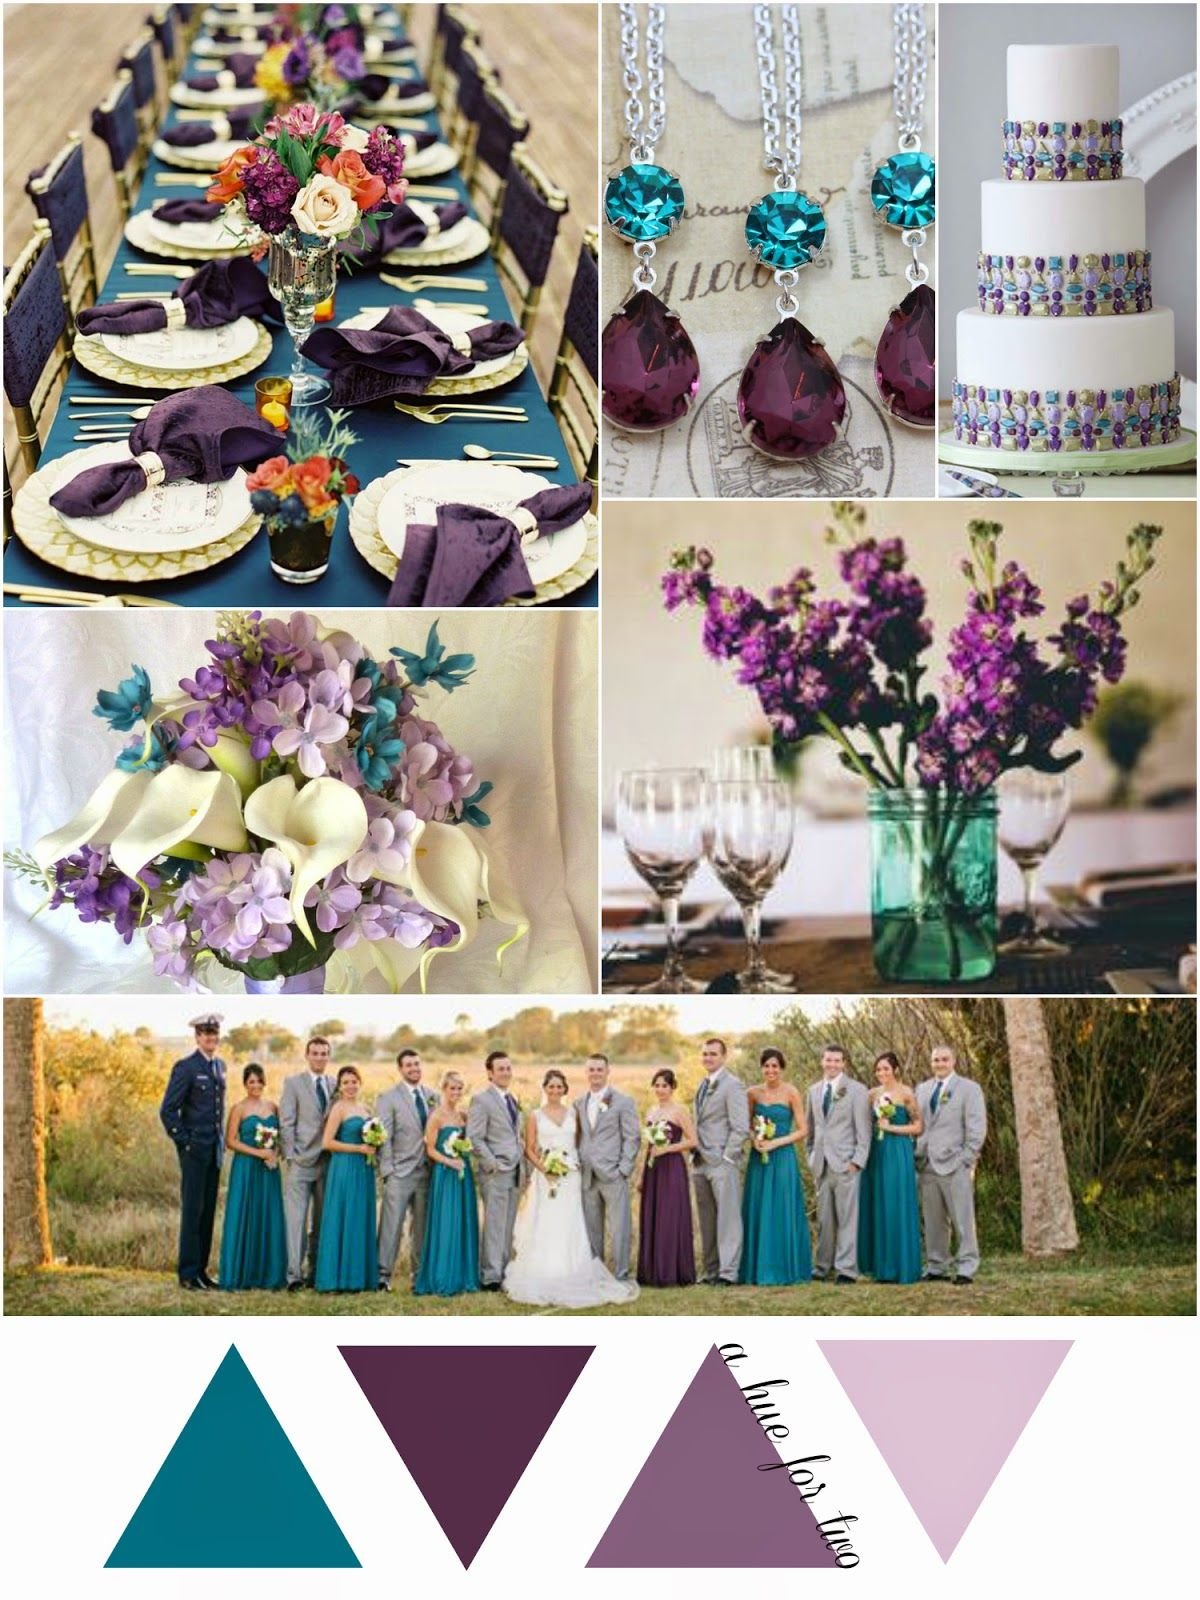 teal eggplant and lavender wedding colors wedding